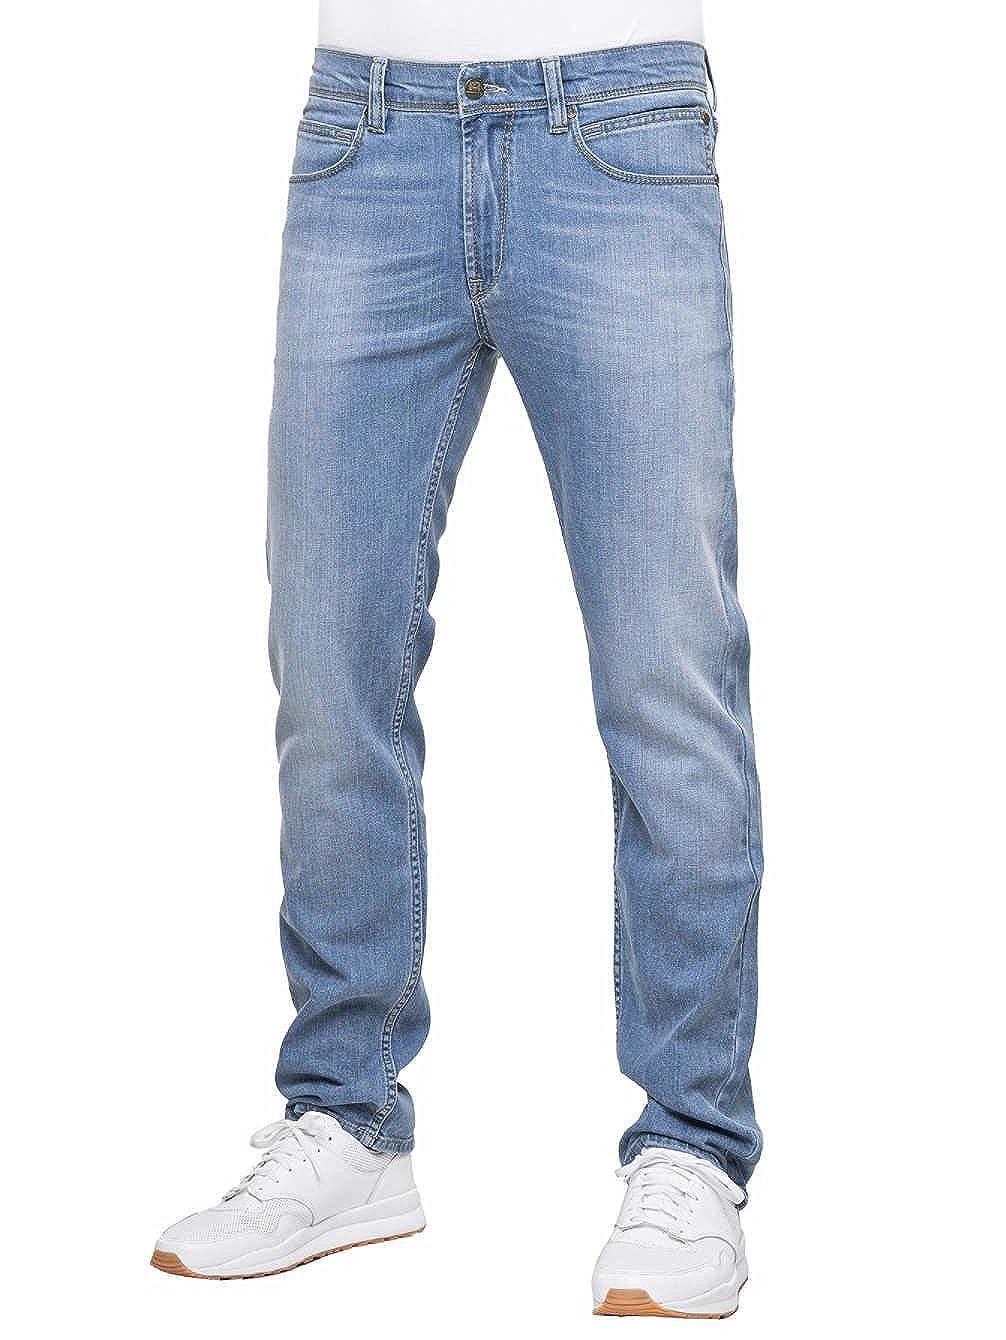 Reell Men Jeans Nova 2 Artikel-Nr.1104-008 - 01-001 Light Blau Stone